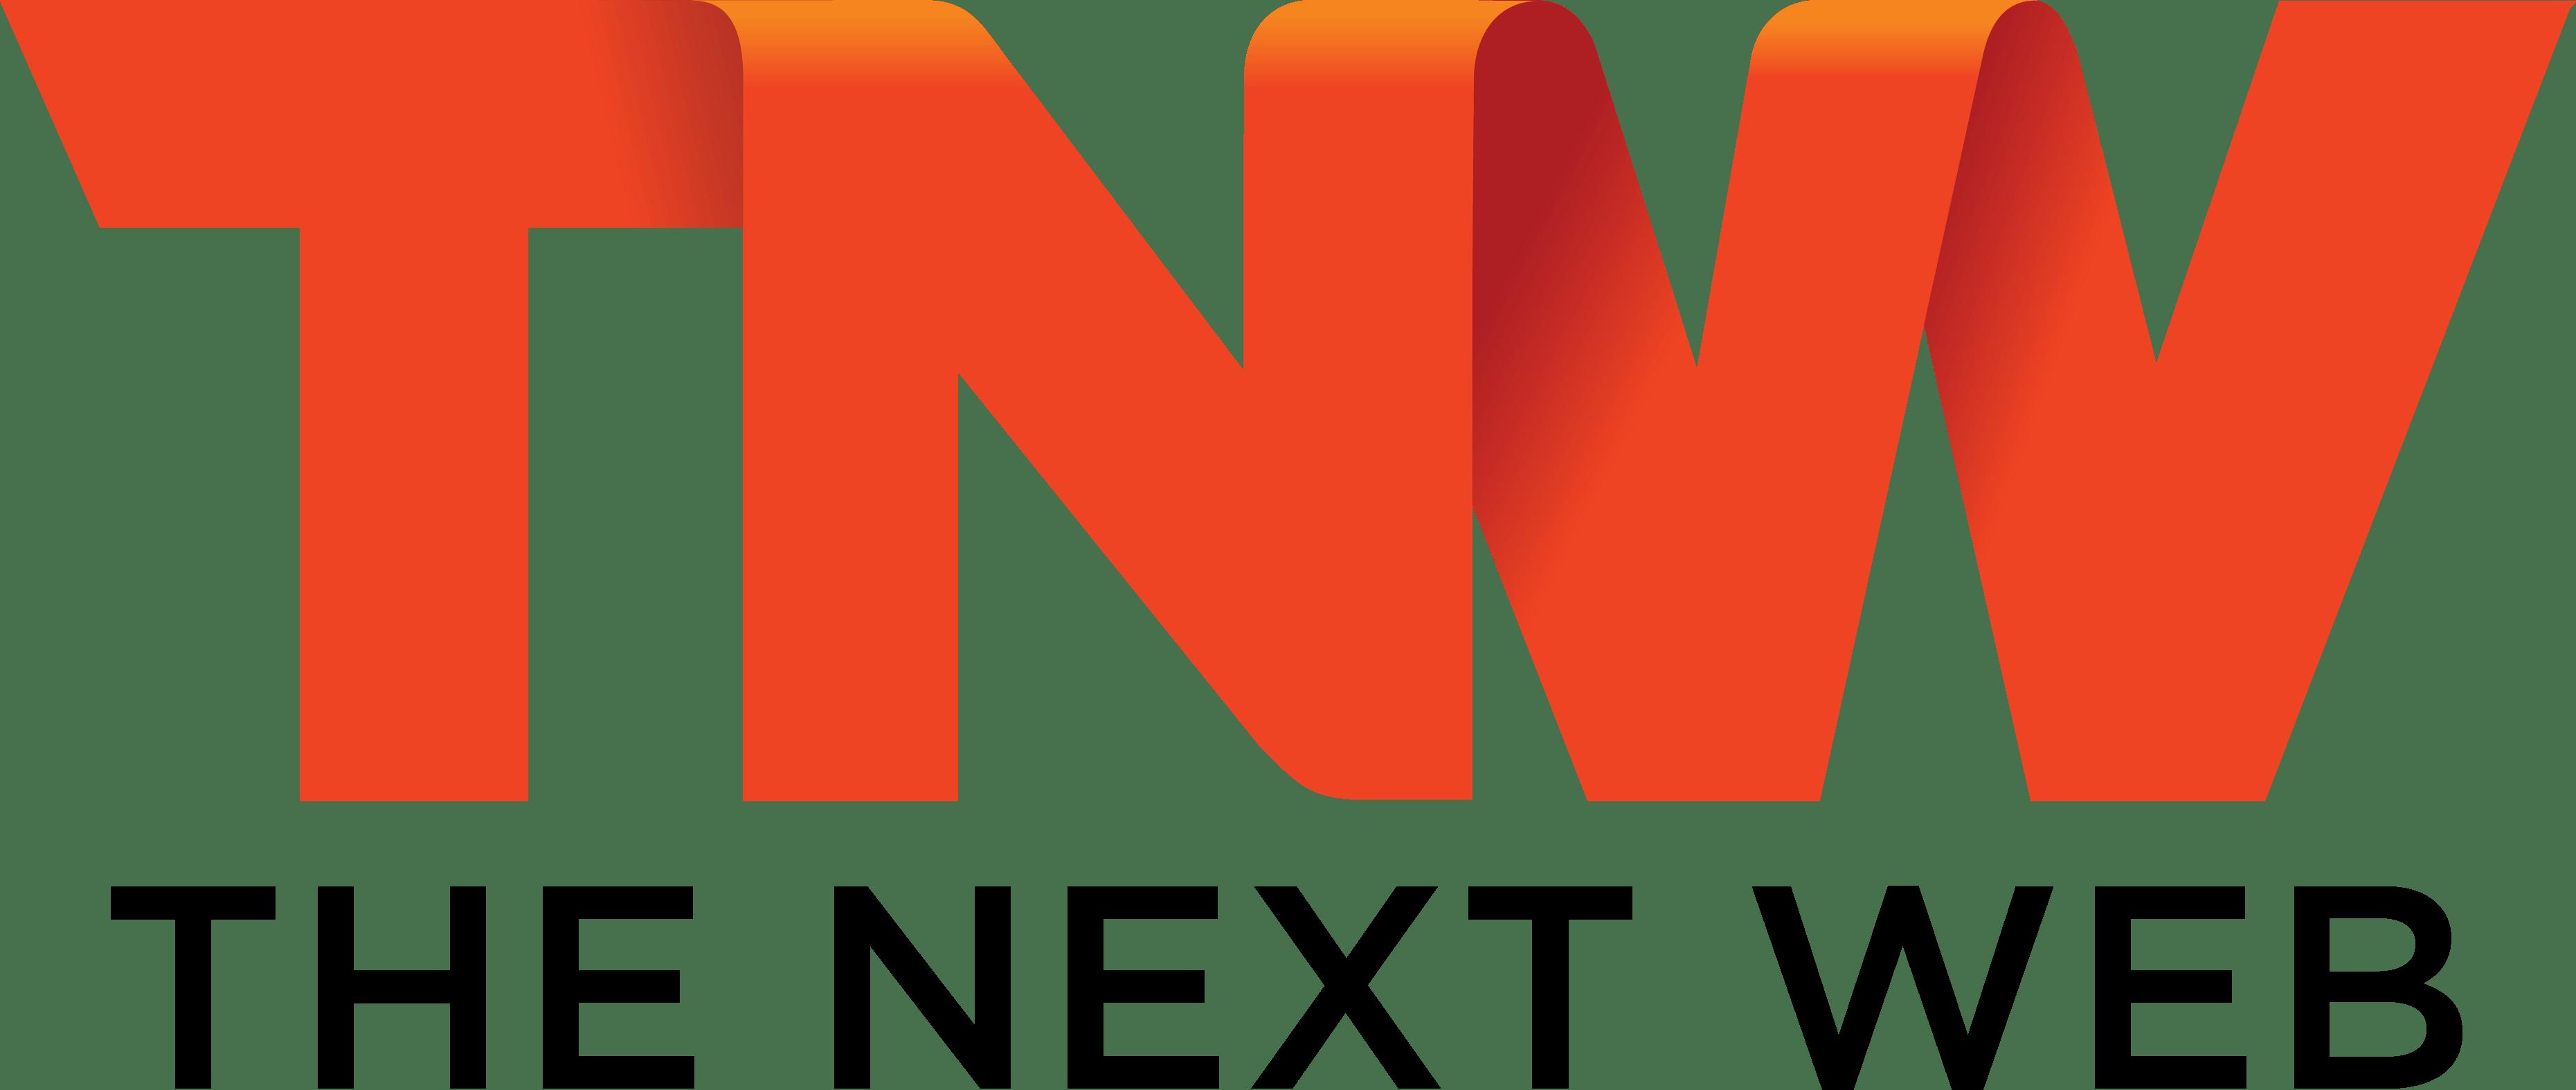 The Next Web HubSpot Research